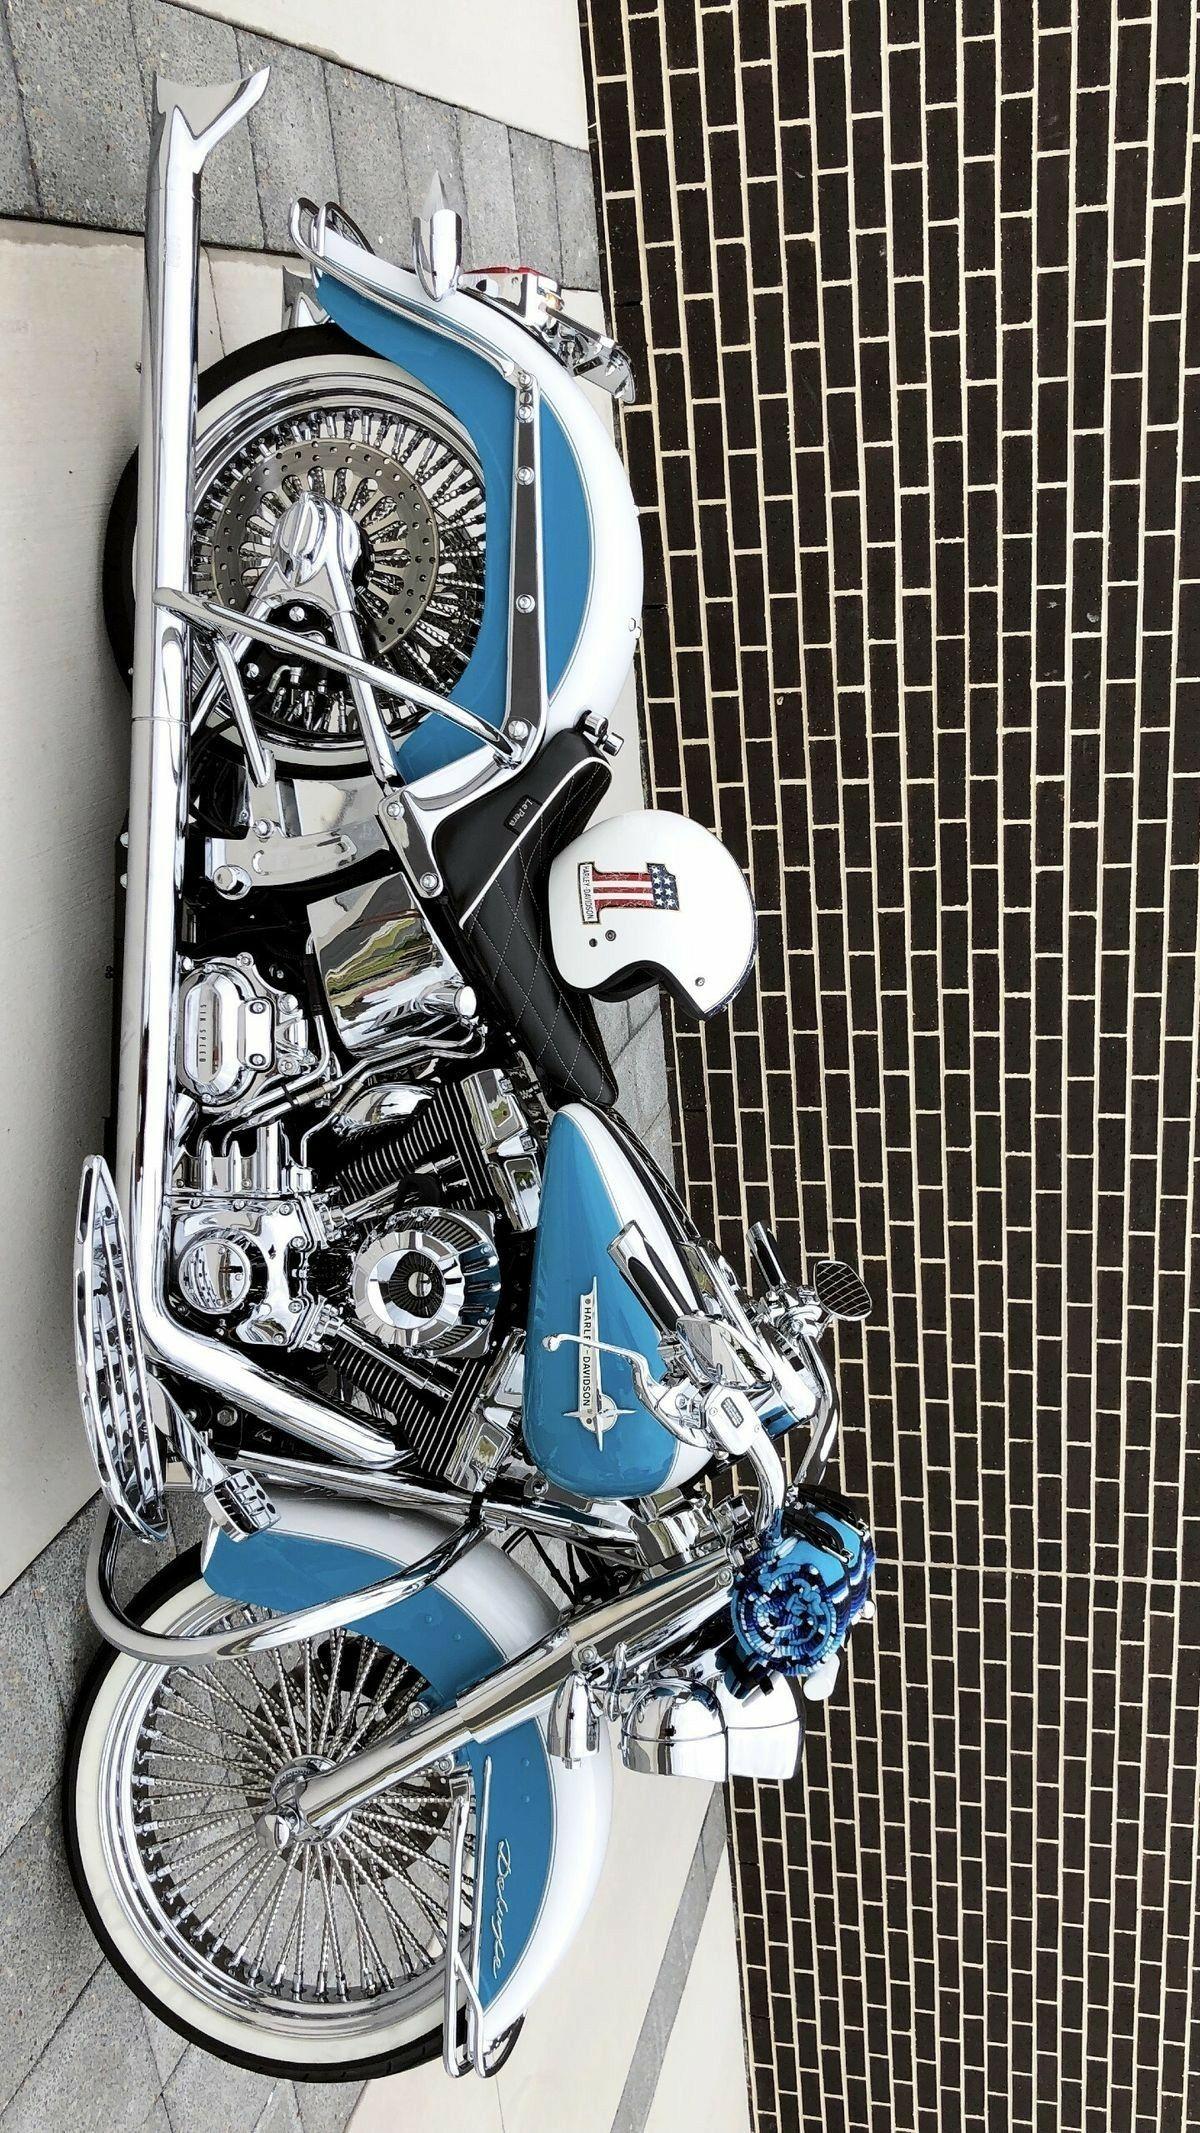 Vintage nhl chopper bike photos